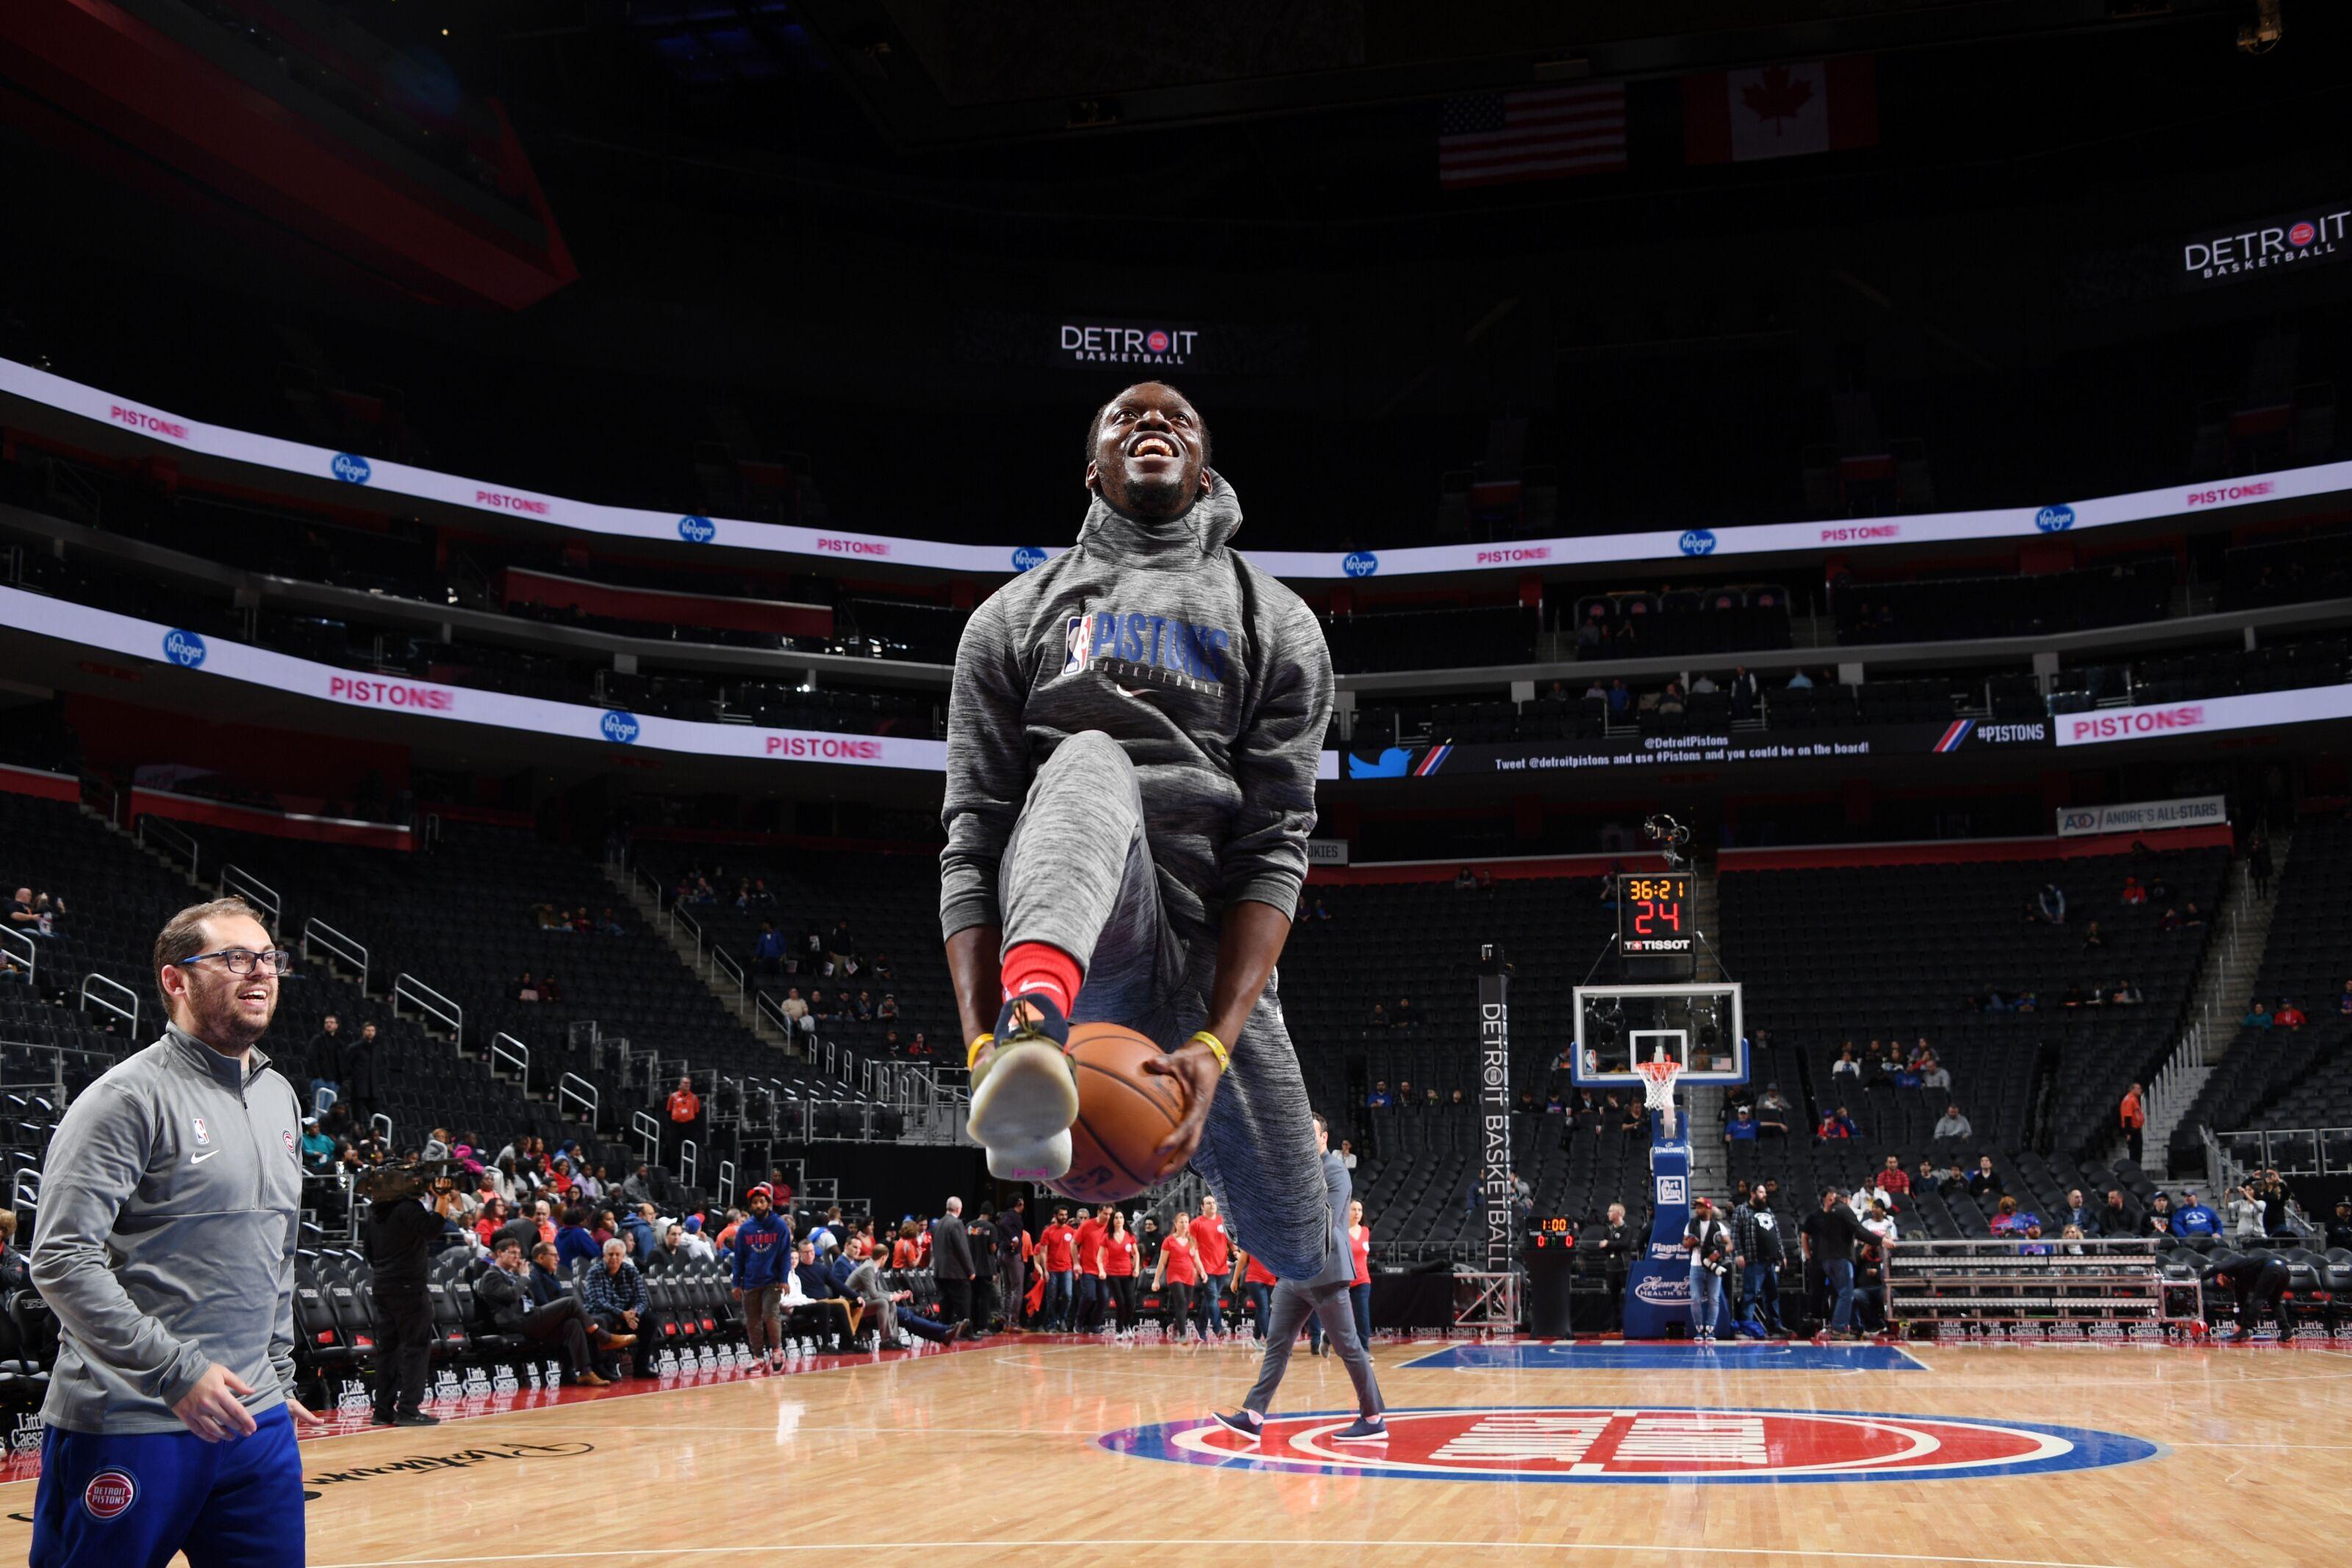 How Reggie Jackson's return can impact the Detroit Pistons